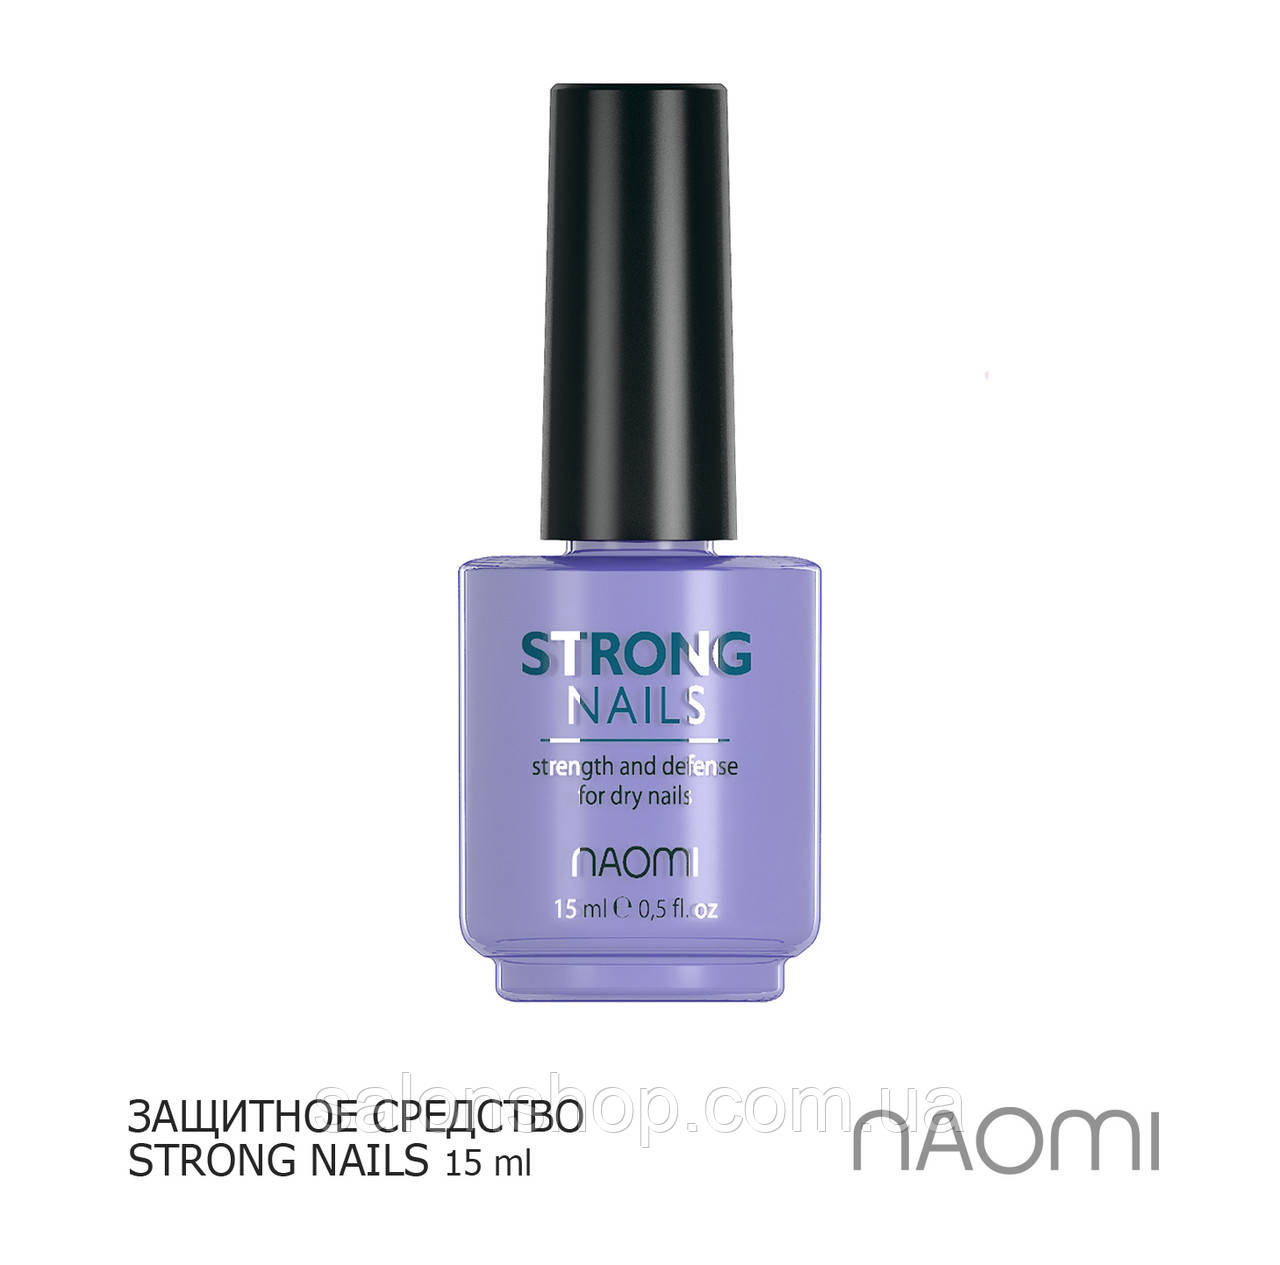 Naomi Strong Nails Міцні нігті, 15 мл